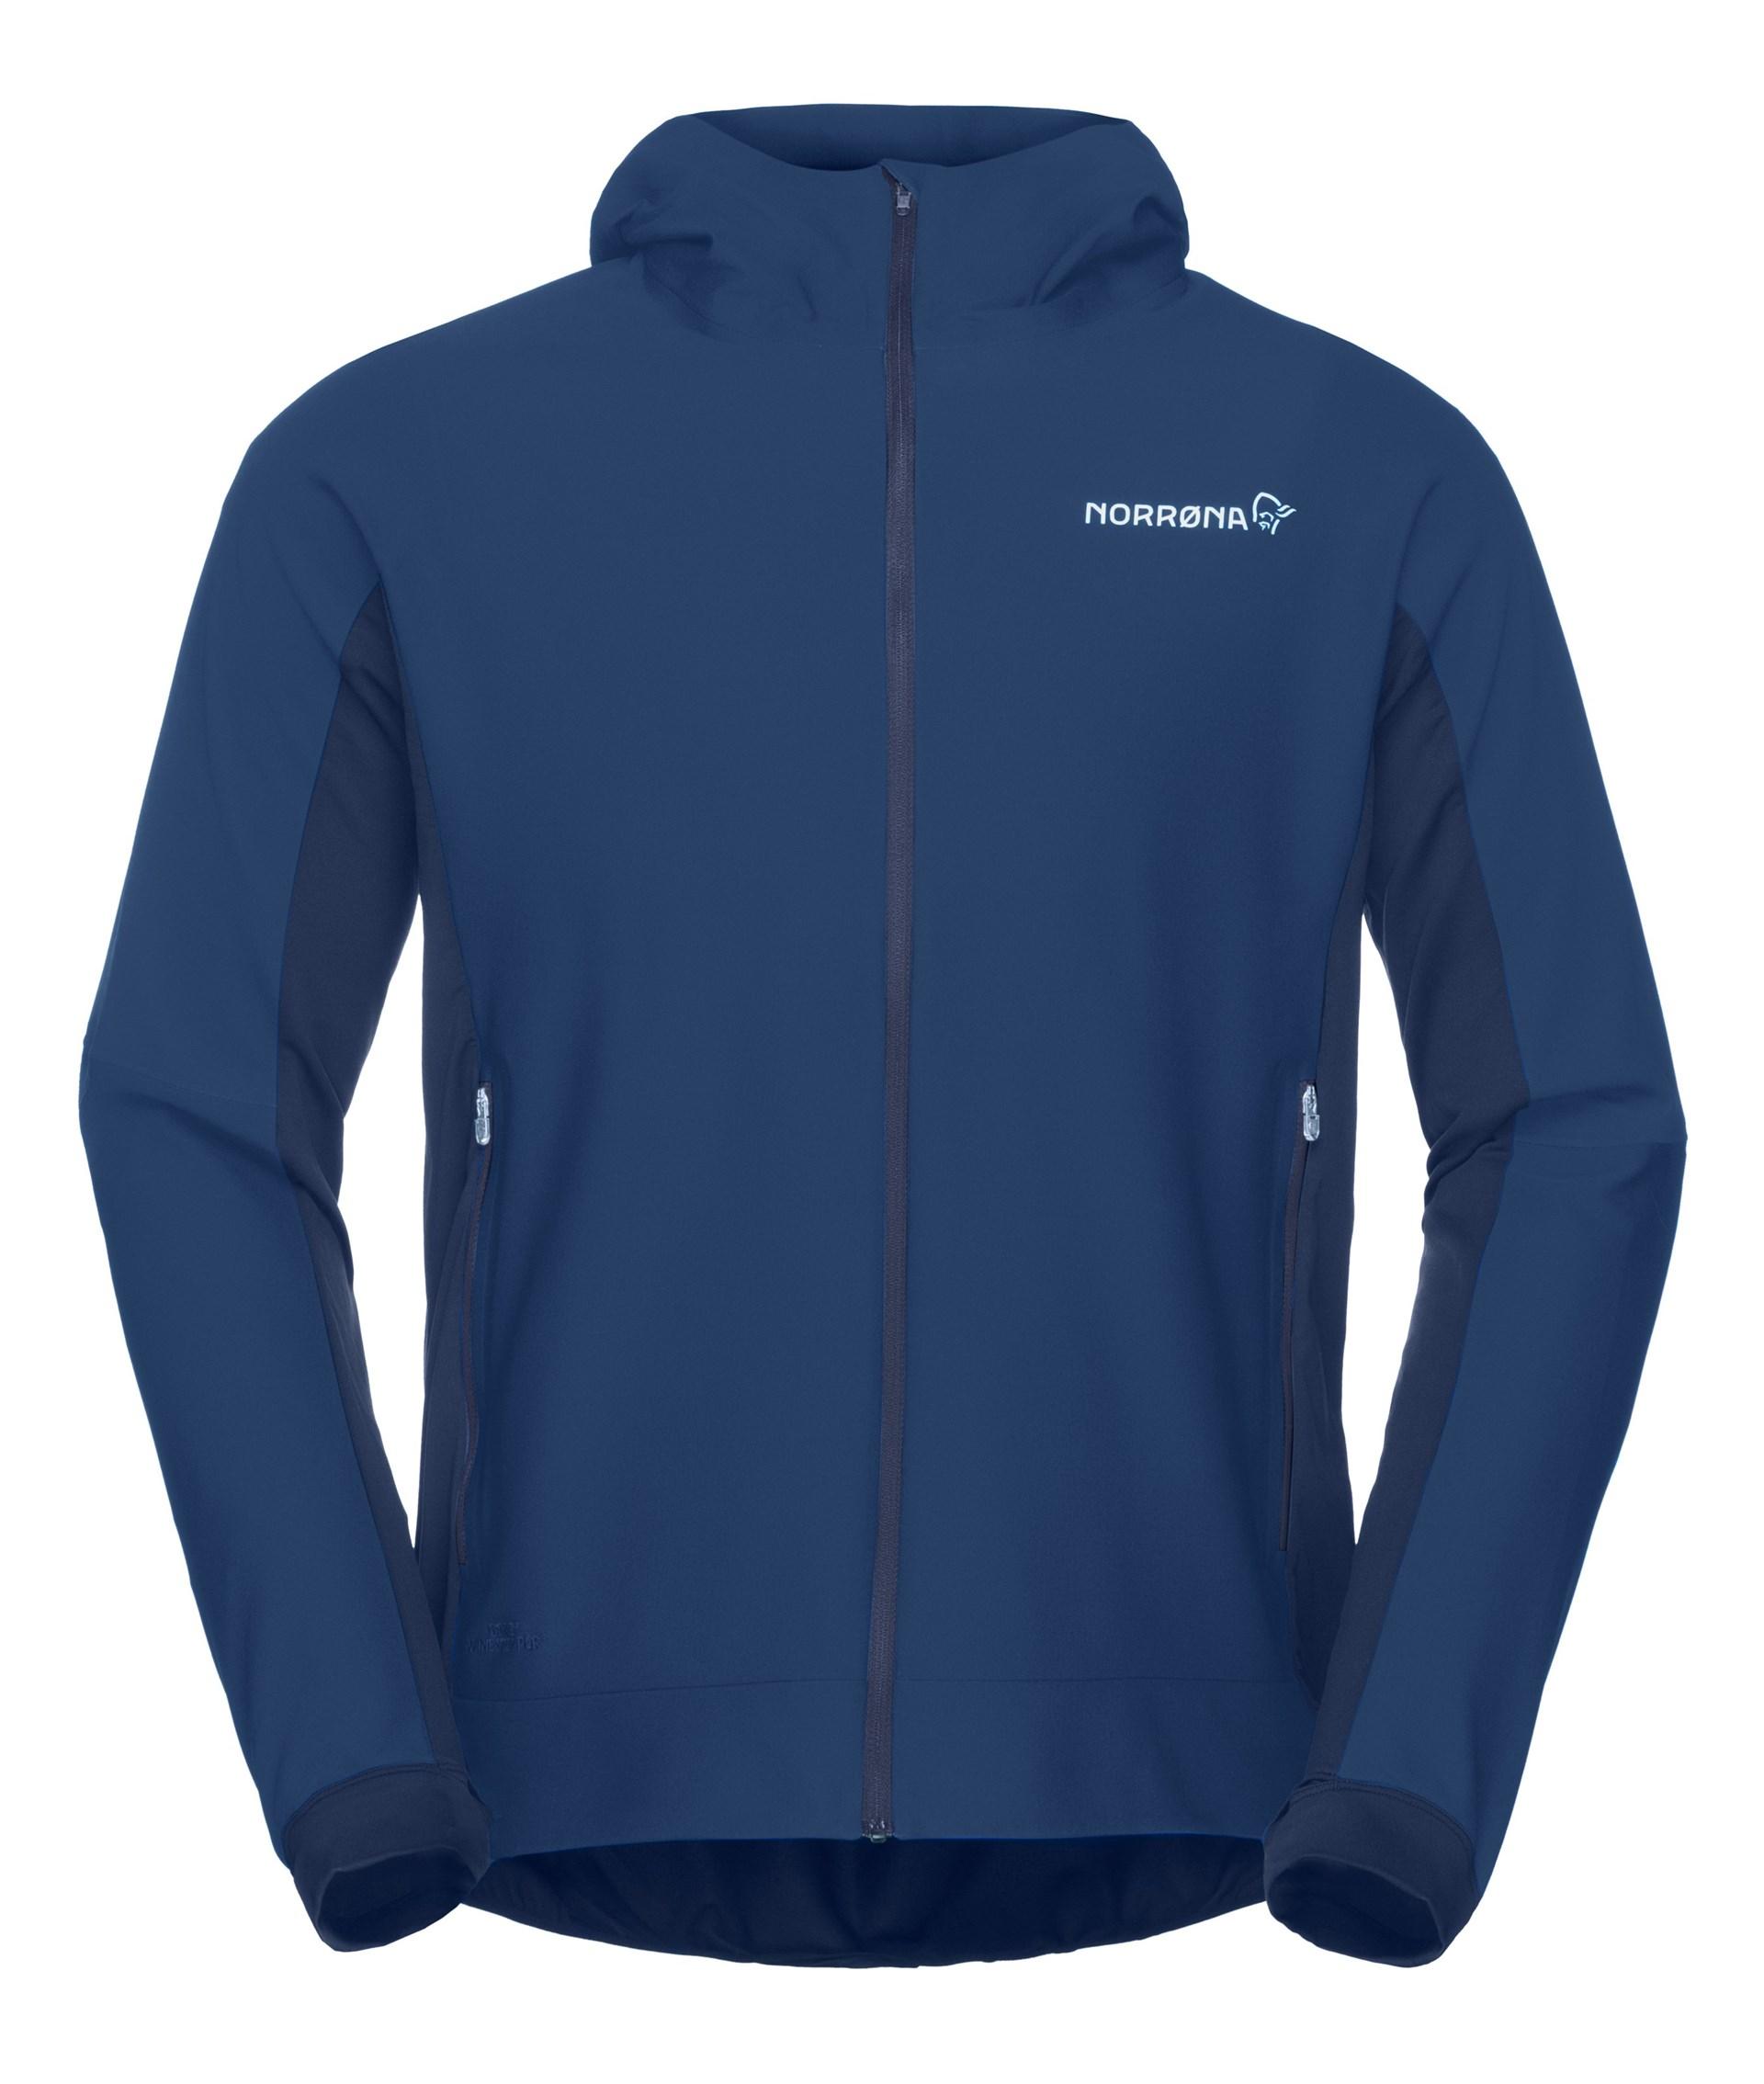 1084268c ... Bilde: Norrøna Bitihorn Windstopper Zip-Hood, jakke herre - Indigo  Night 2602-